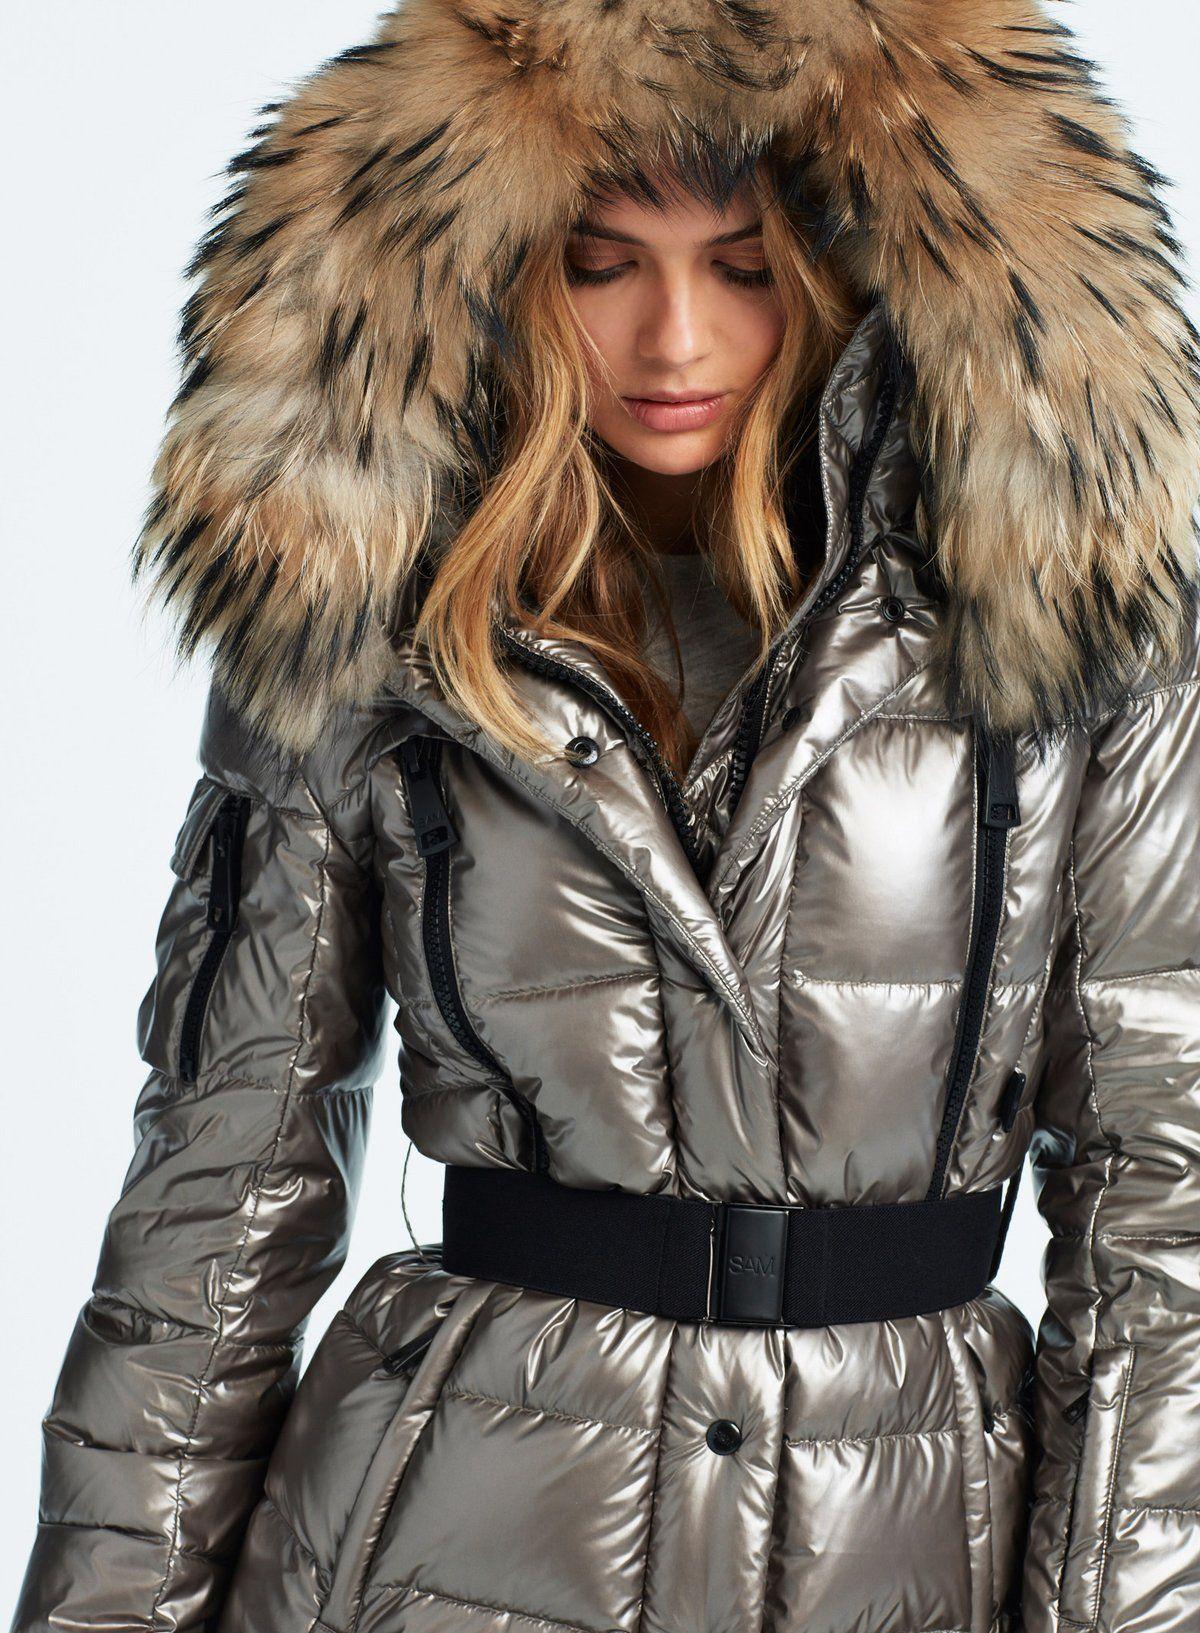 Millennium Gunmetal Hooded Winter Coat Puffer Jacket Women Fashion [ 1633 x 1200 Pixel ]